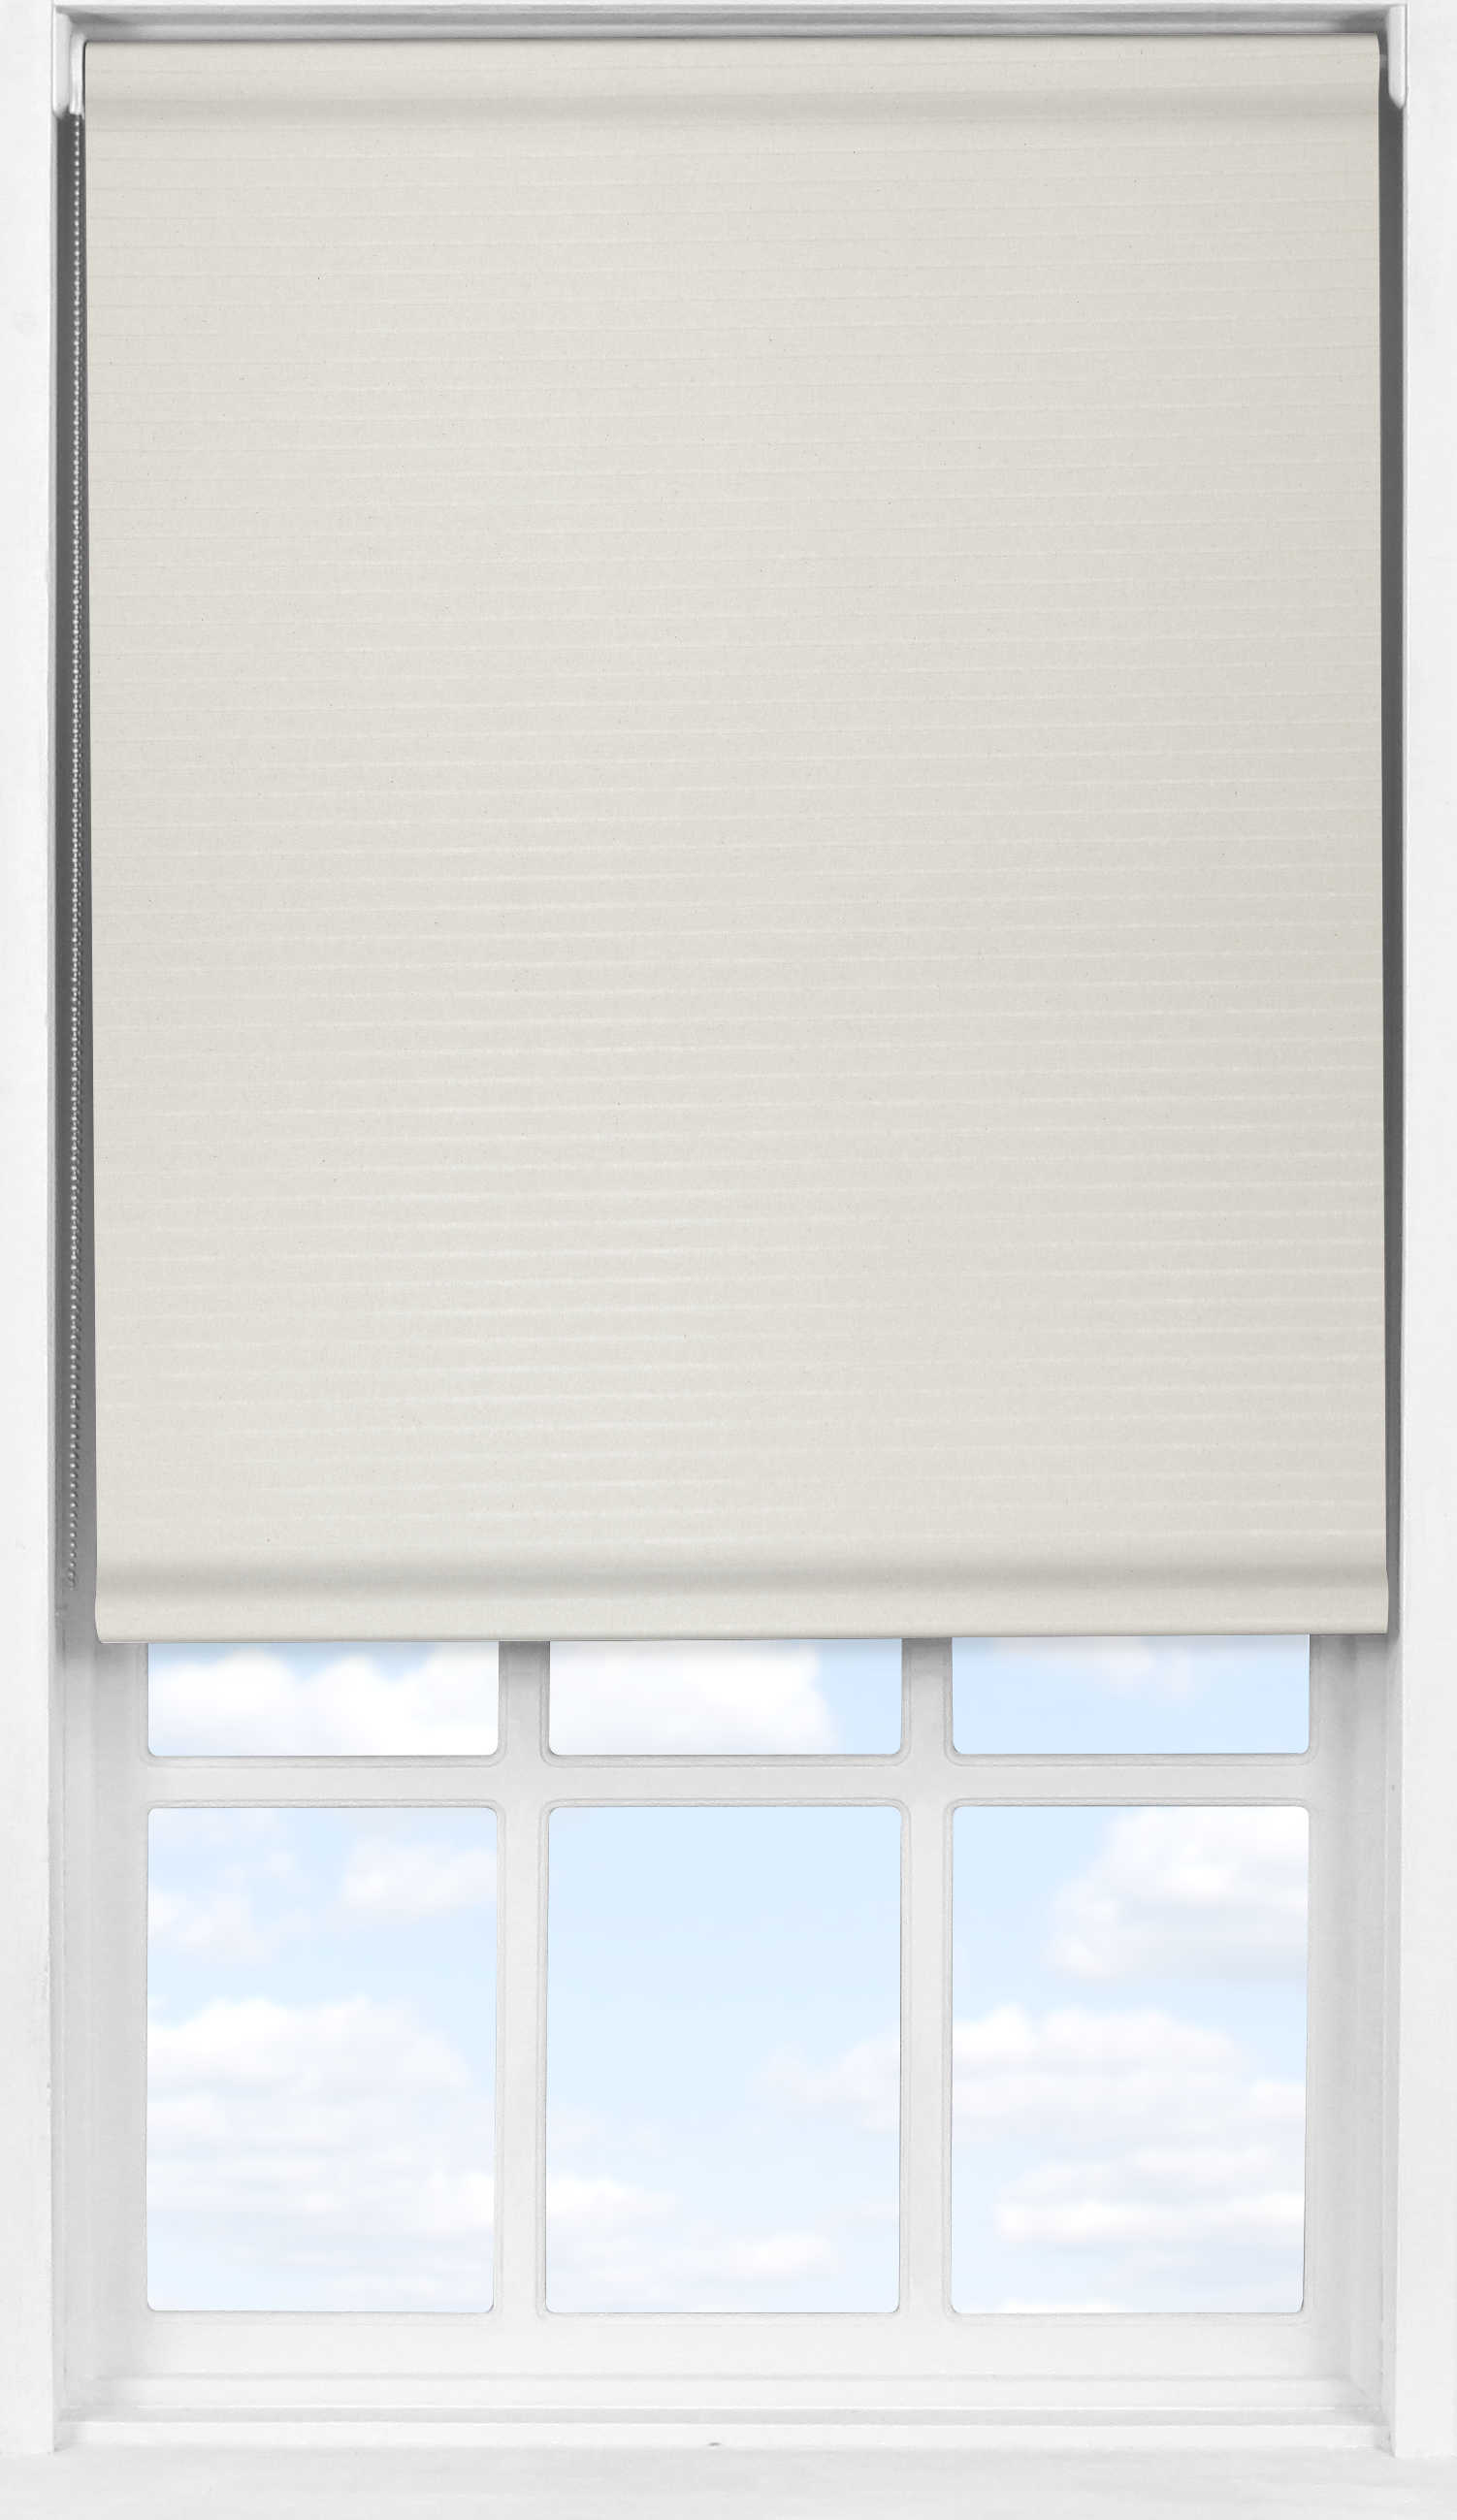 Easifit Roller Blind in Wide Stripe Cream Transparent